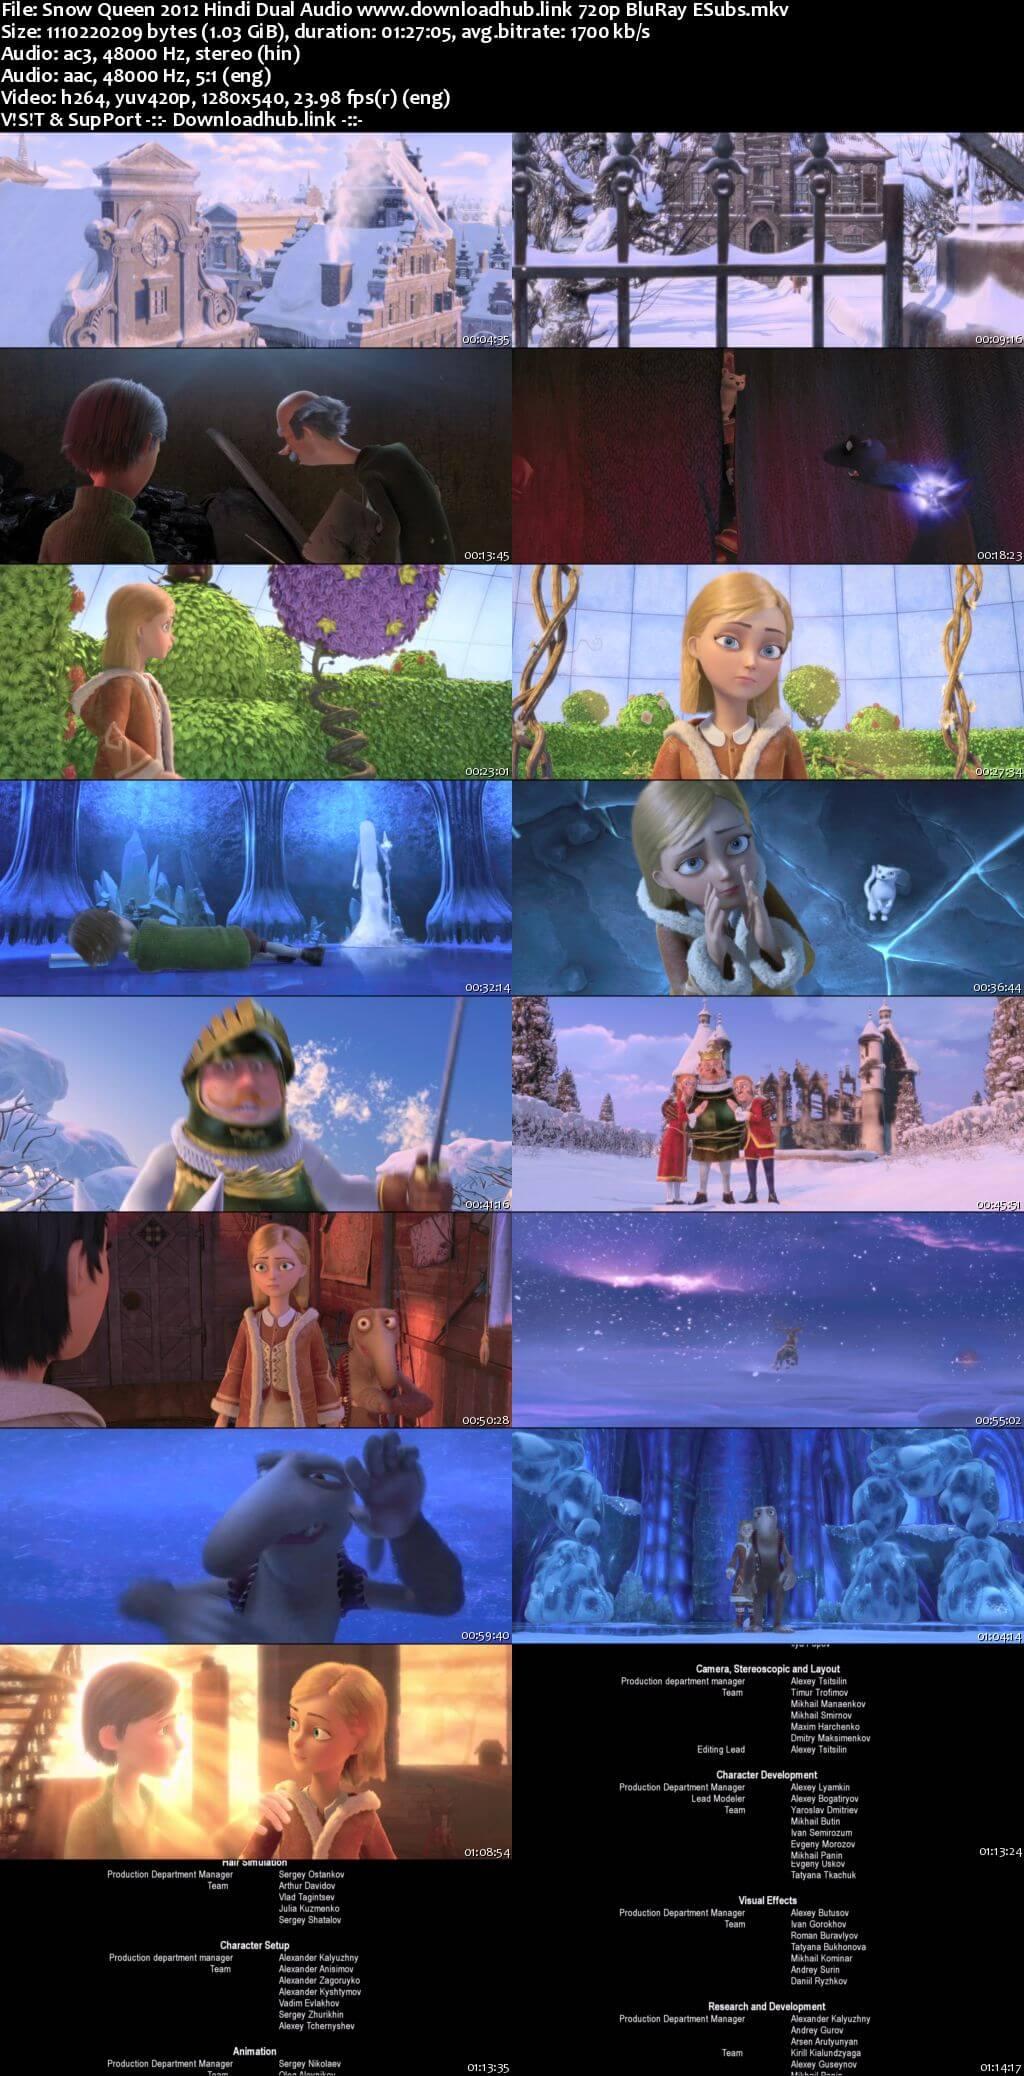 Snow Queen 2012 Hindi Dual Audio 720p BluRay ESubs